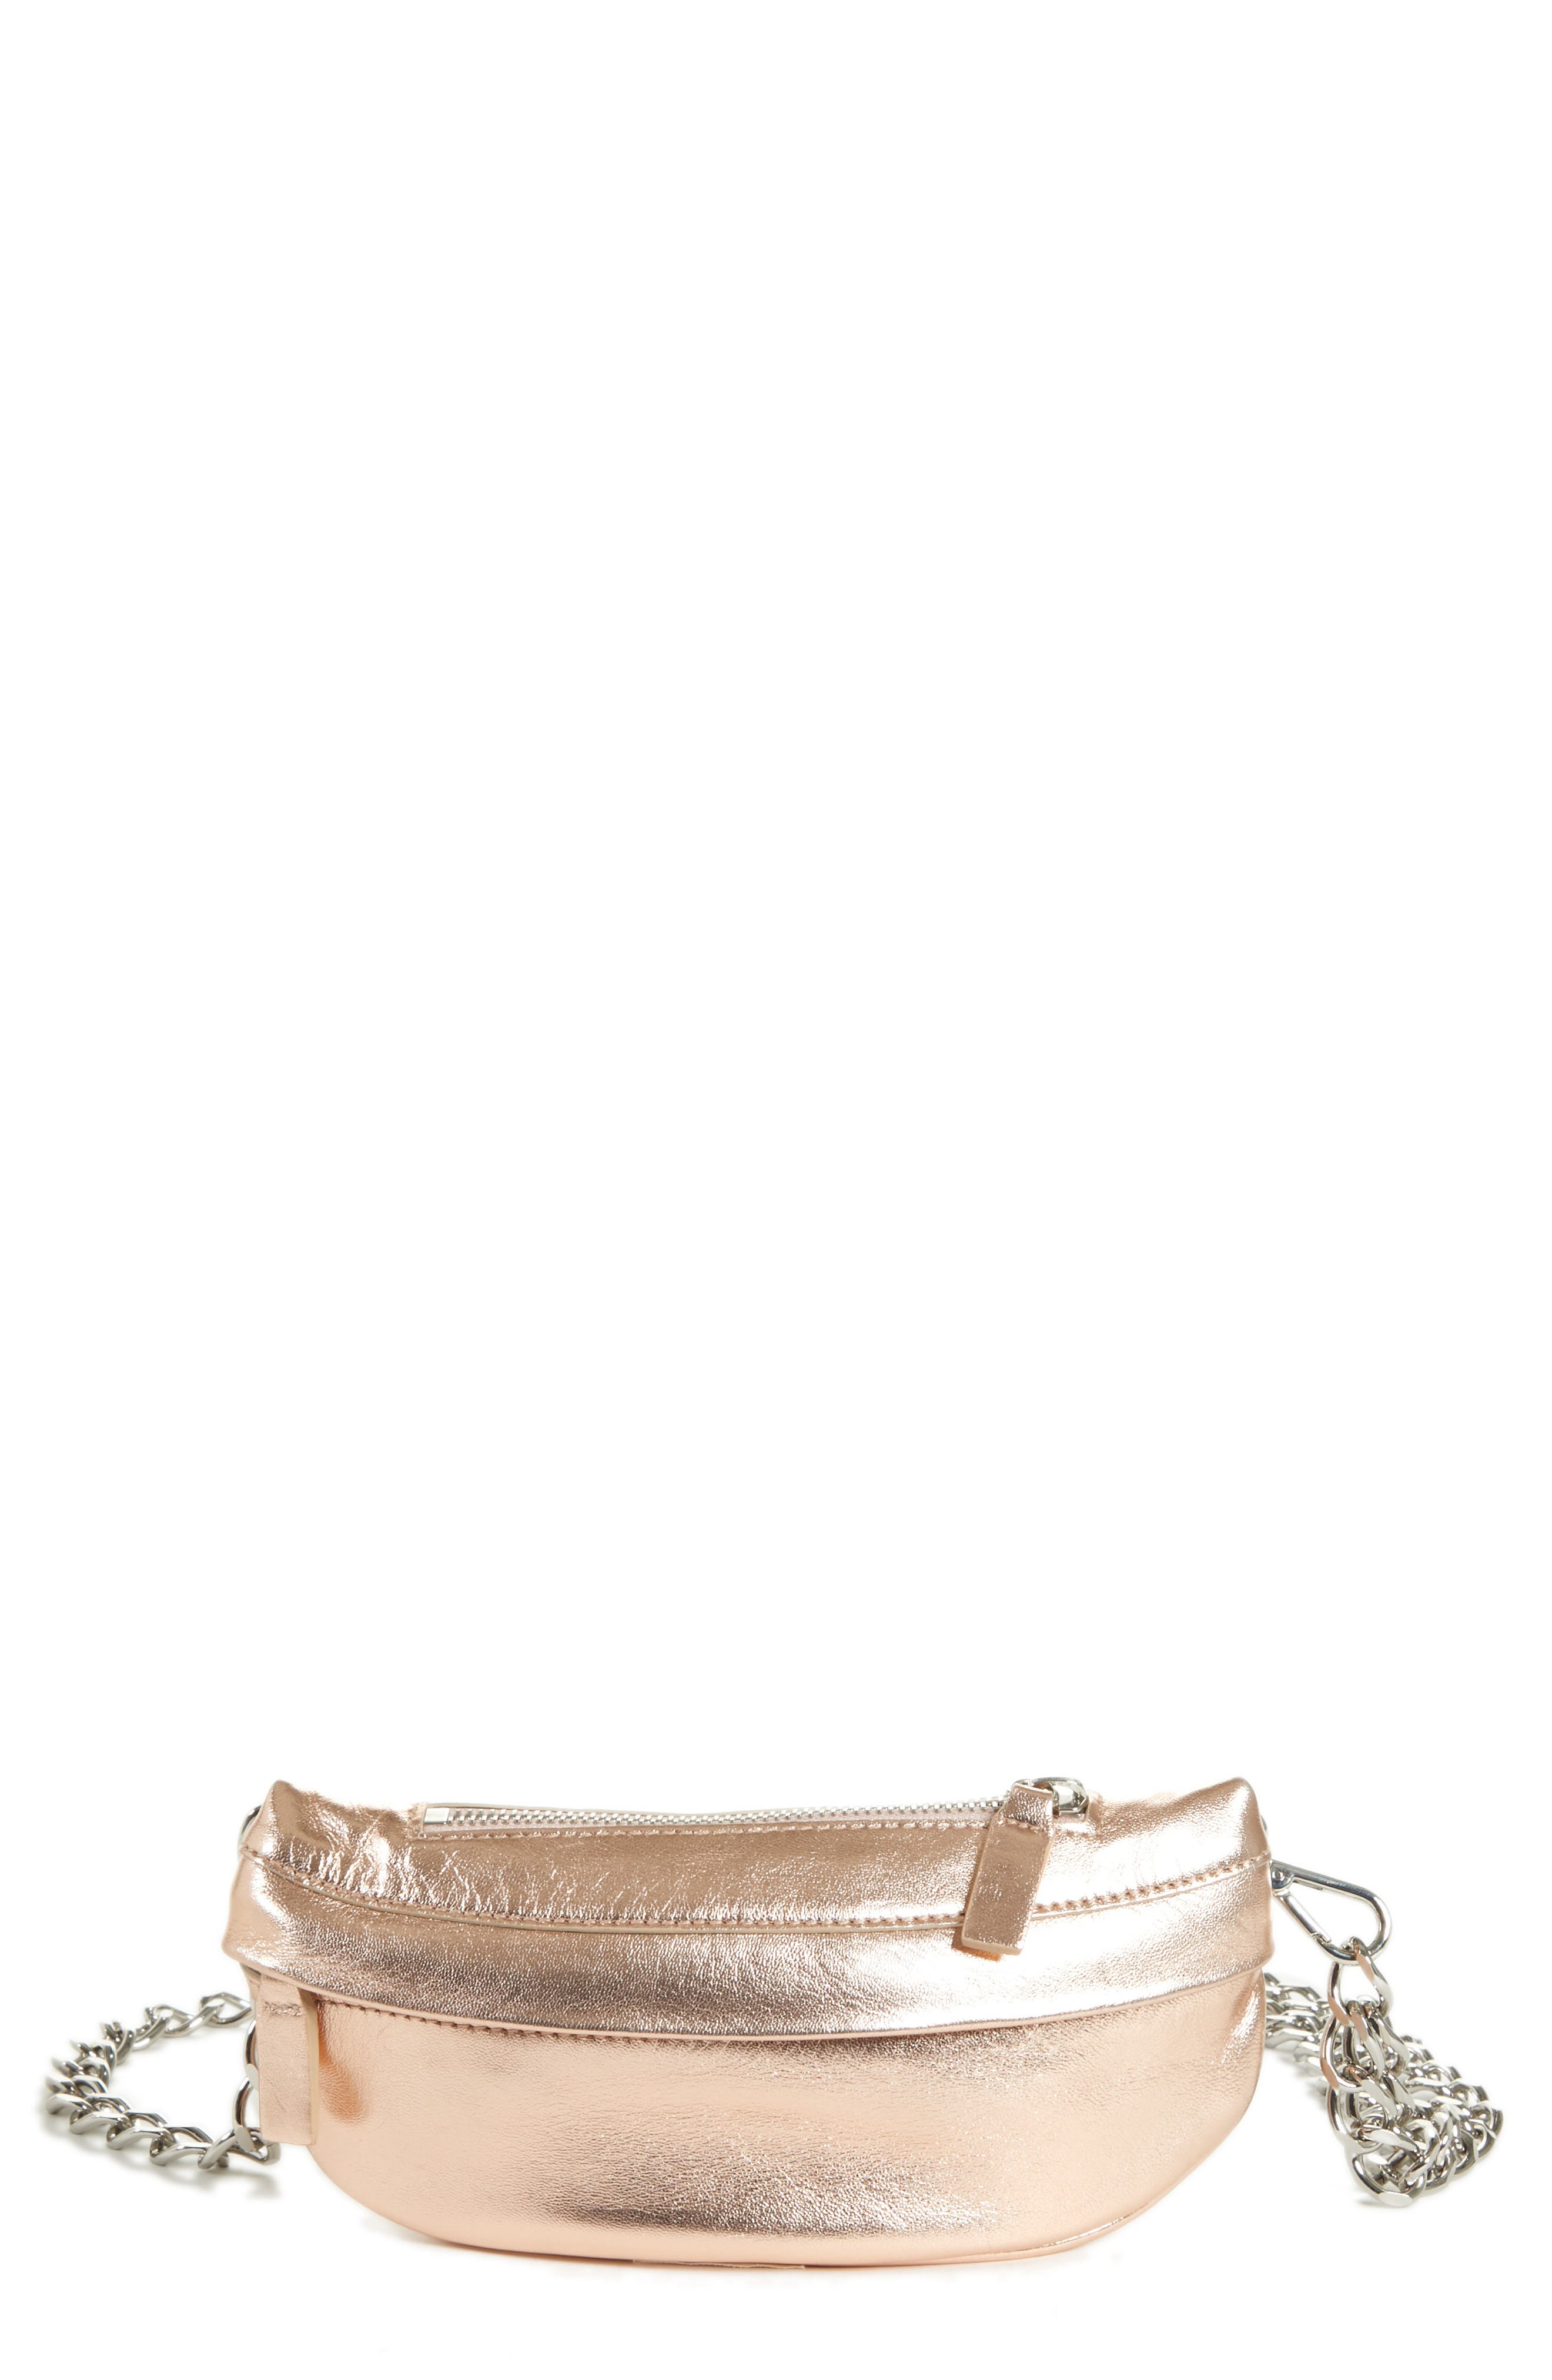 AVEC LA TROUPE Mini Metallic Troupe Convertible Belt Bag - Pink in Rose Gold